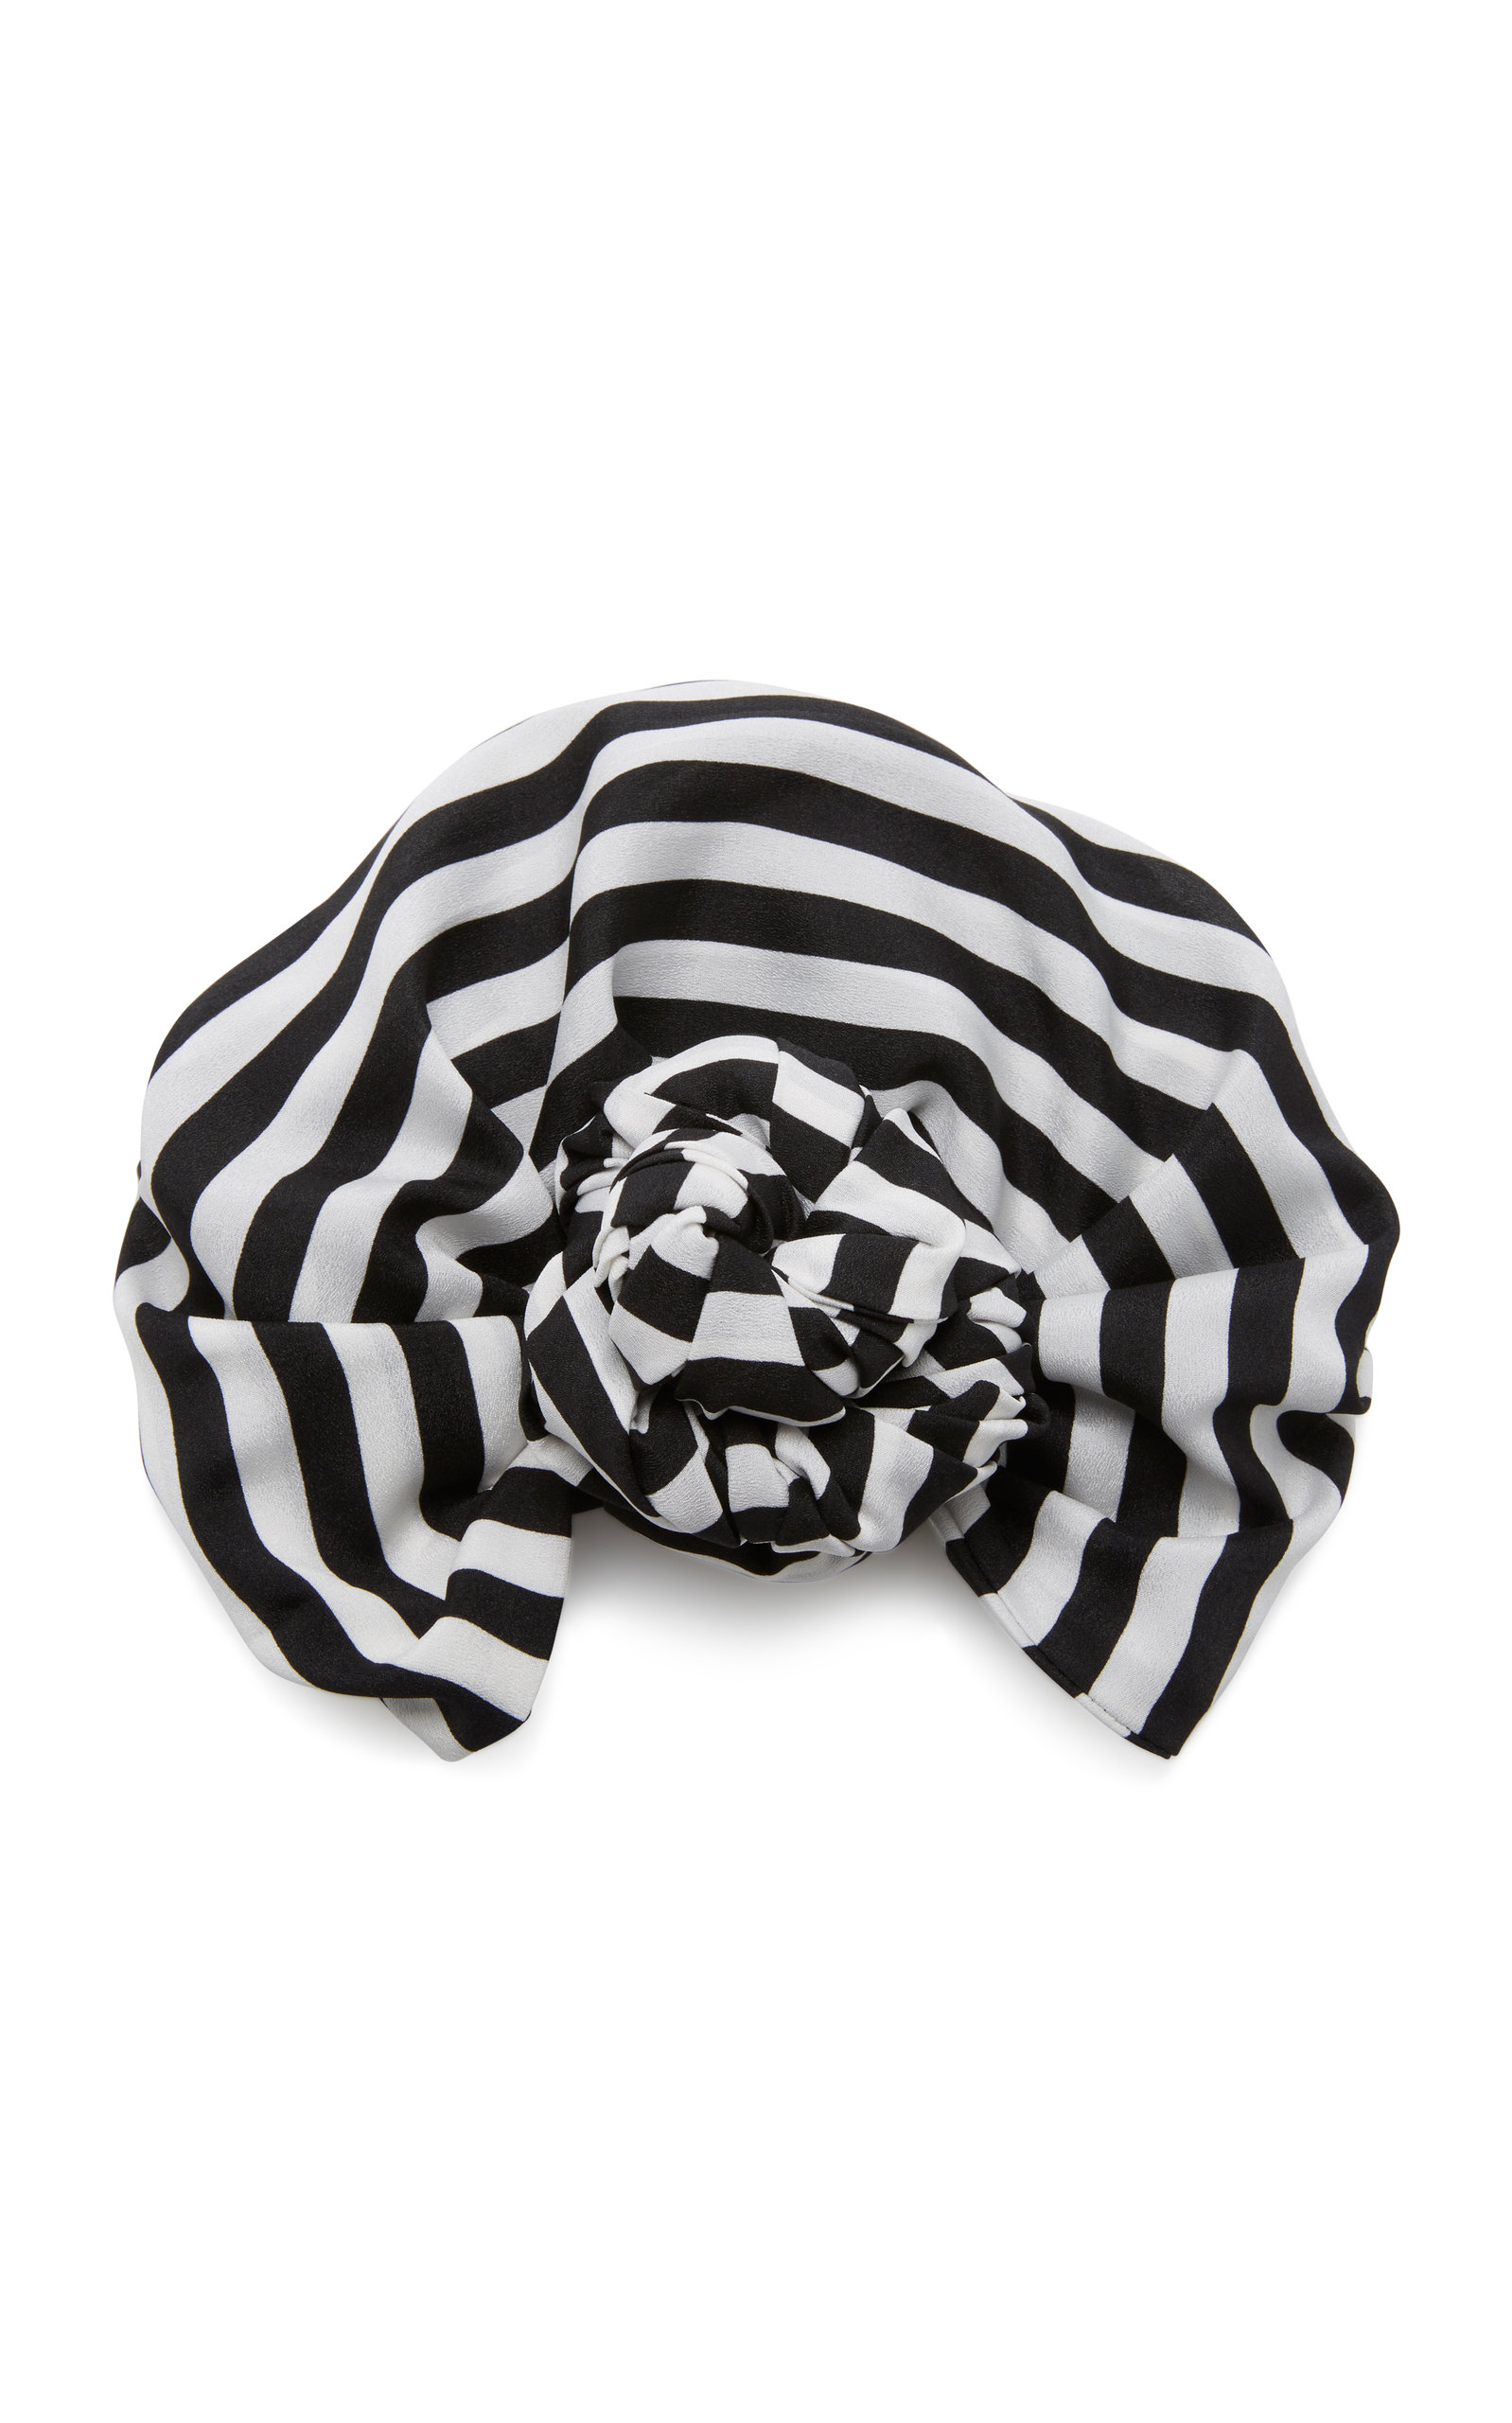 JULIA CLANCEY M'O Exclusive Edith Striped Satin Headwrap in Black/White